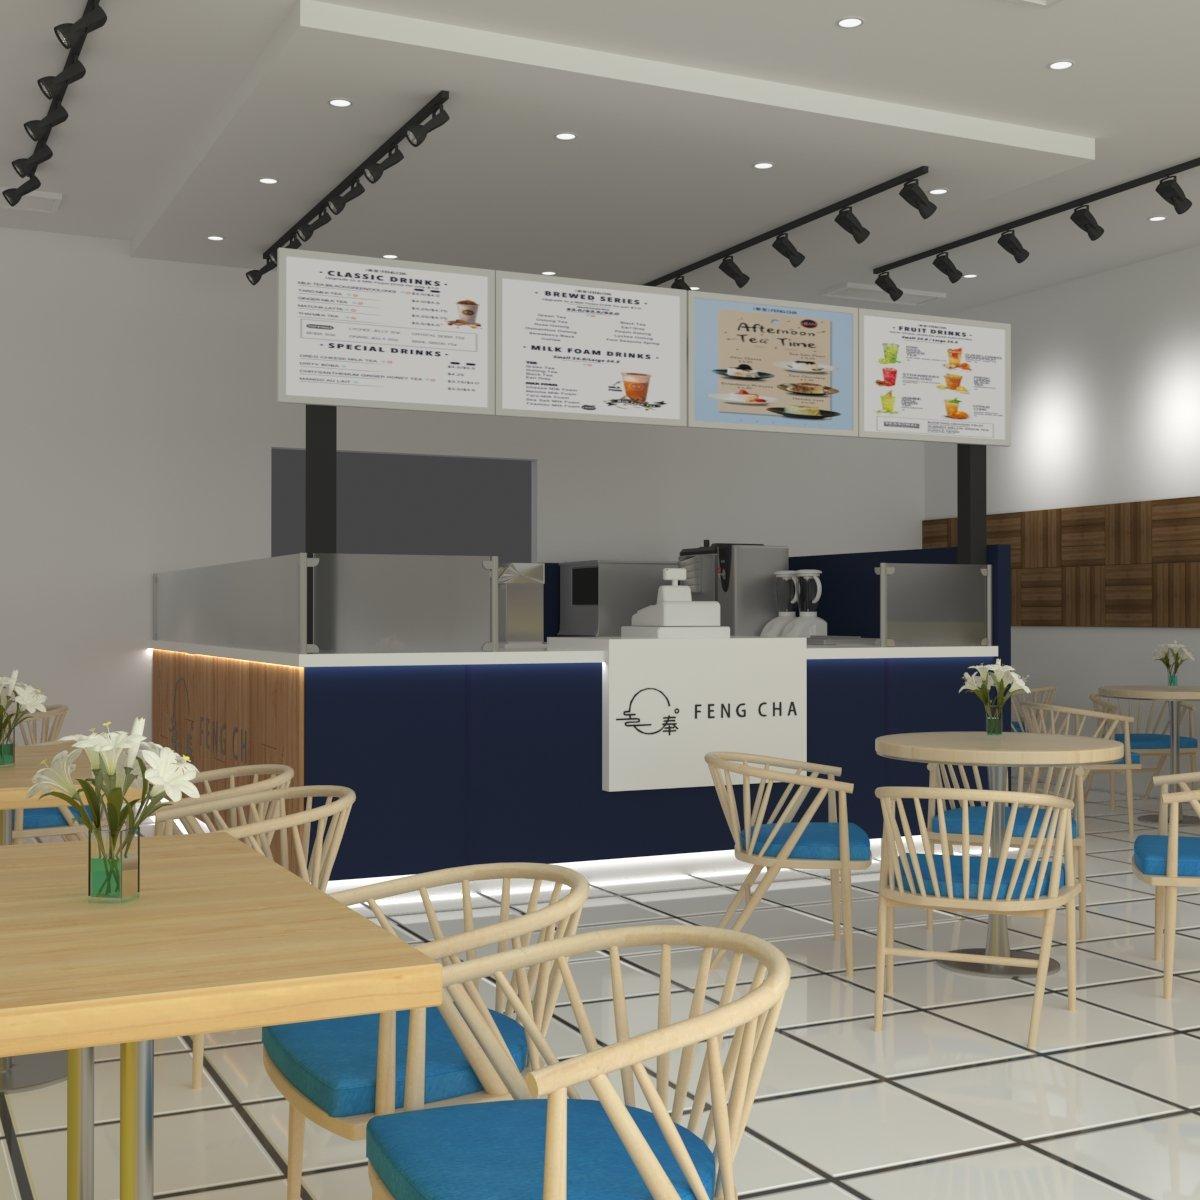 Milk Tea Kiosk Design Bubble Tea Store Work Counter To Make The Bubble Tea